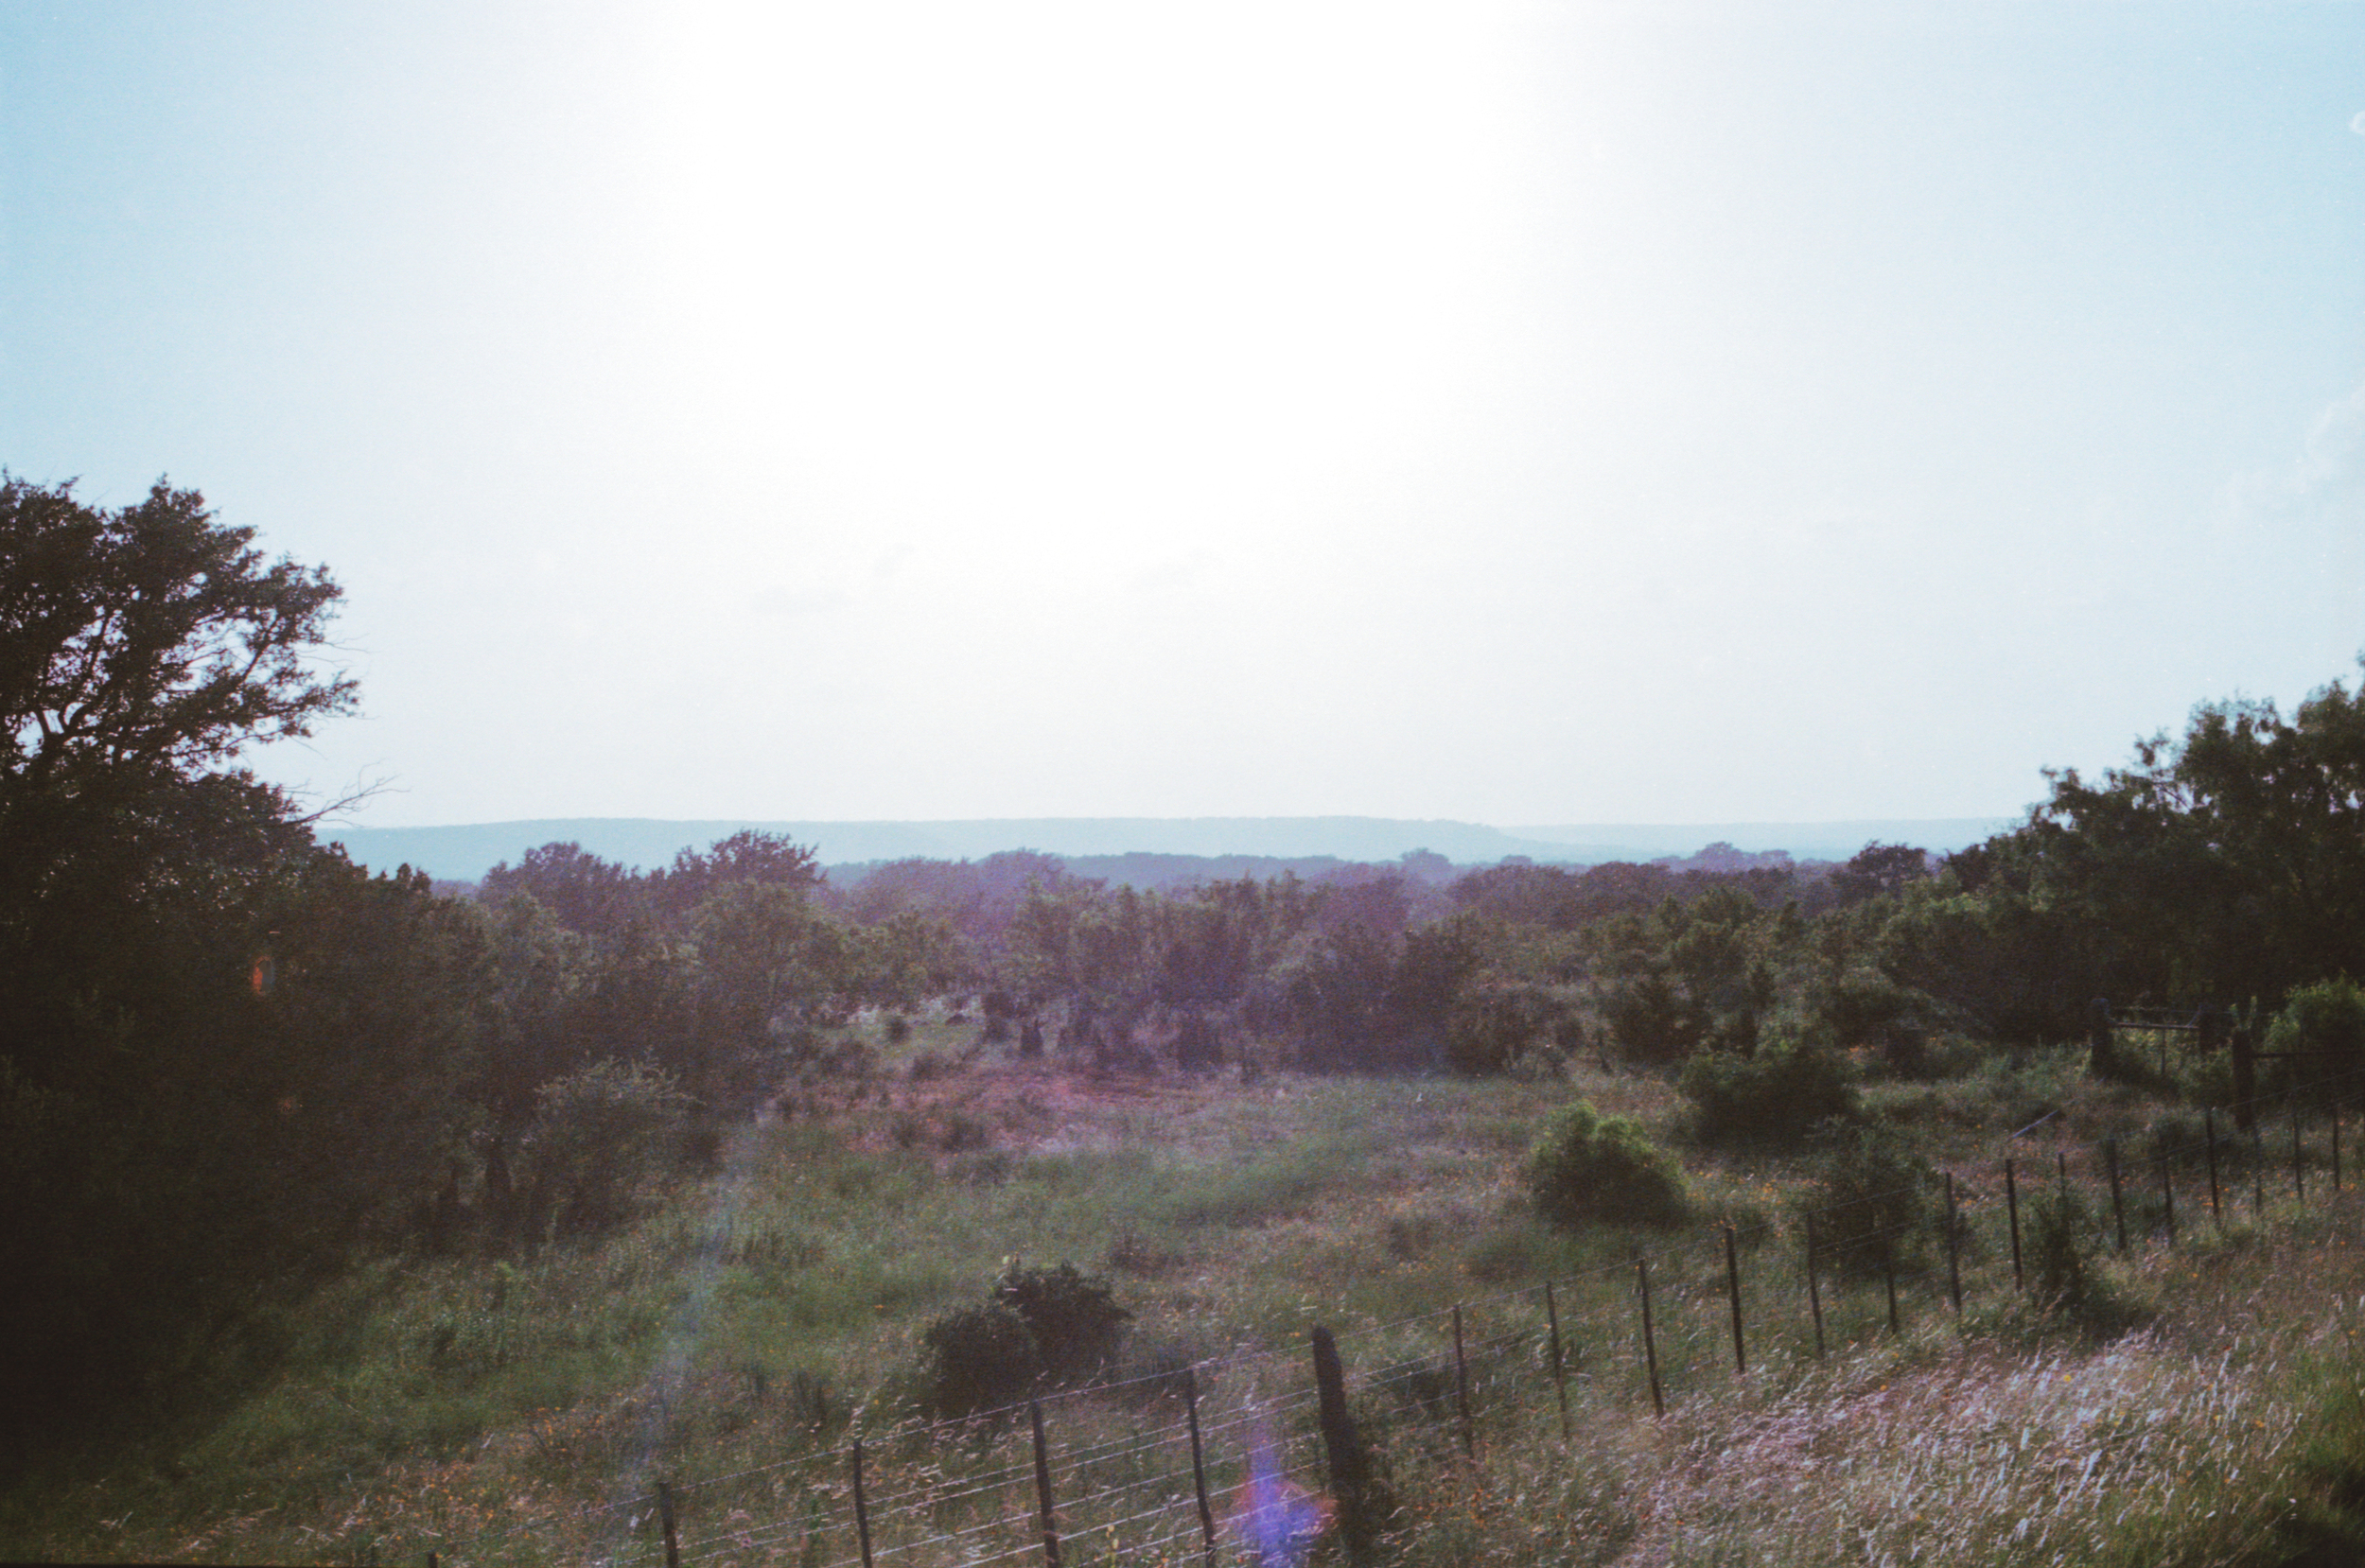 texas llano trees 35mm film america pawlowski whatley camping camp river